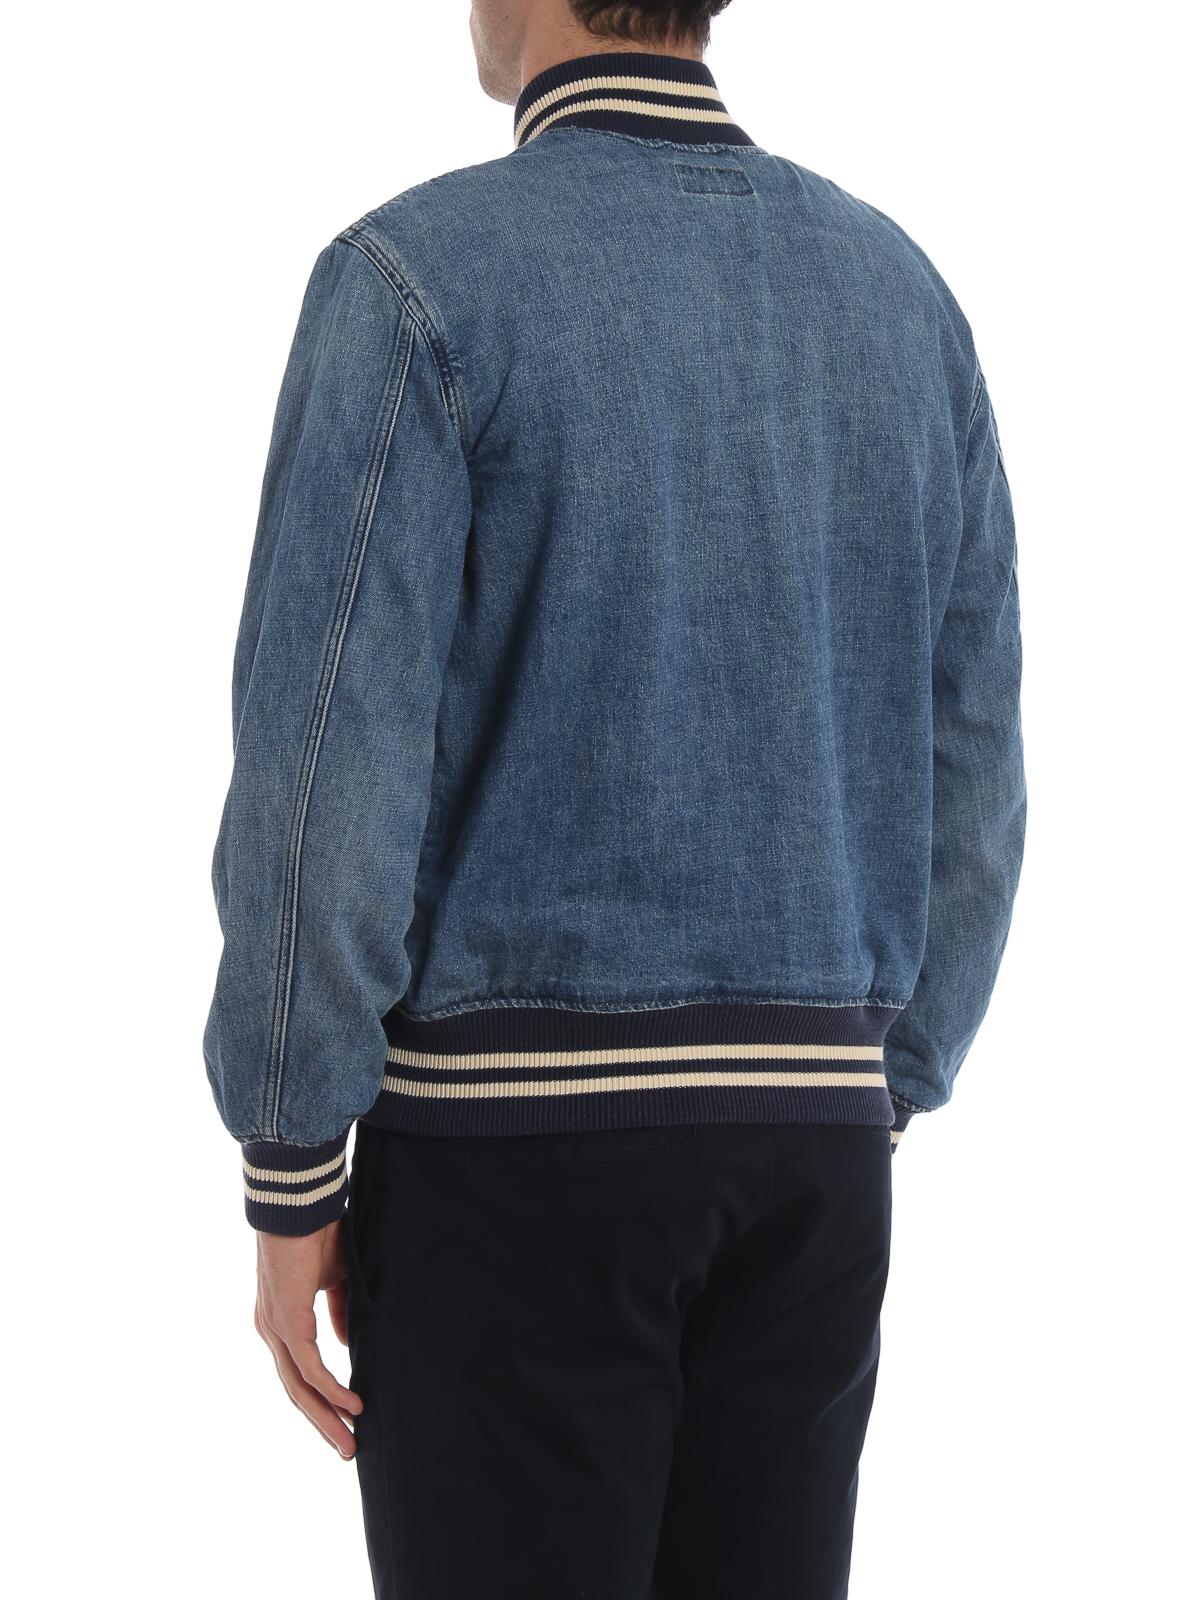 cd7fb178a4c422 Polo Ralph Lauren - Cotton denim bomber jacket - denim jacket ...